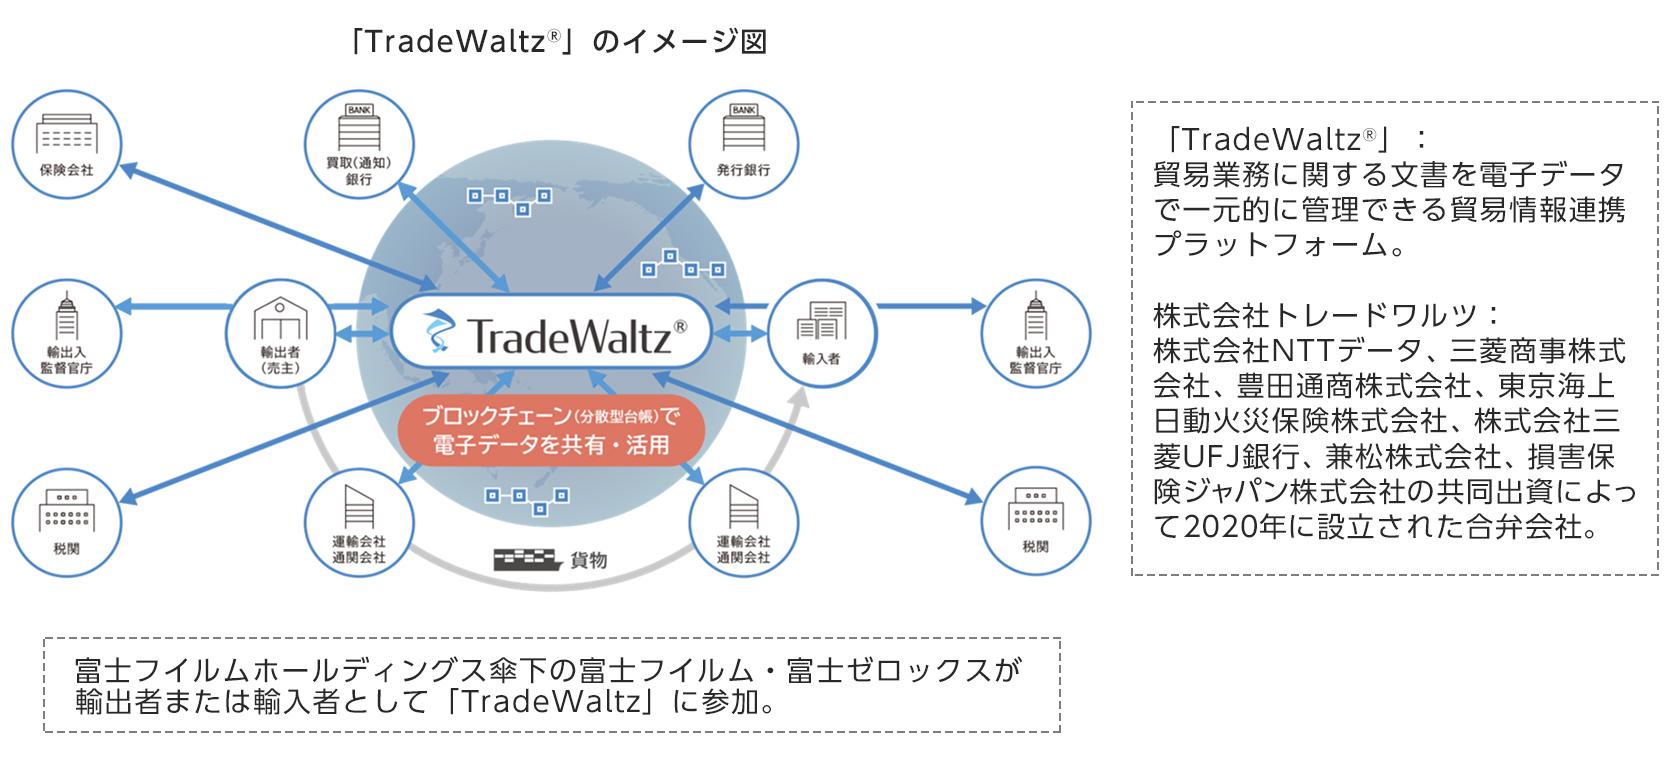 「TradeWaltz®」のイメージ図